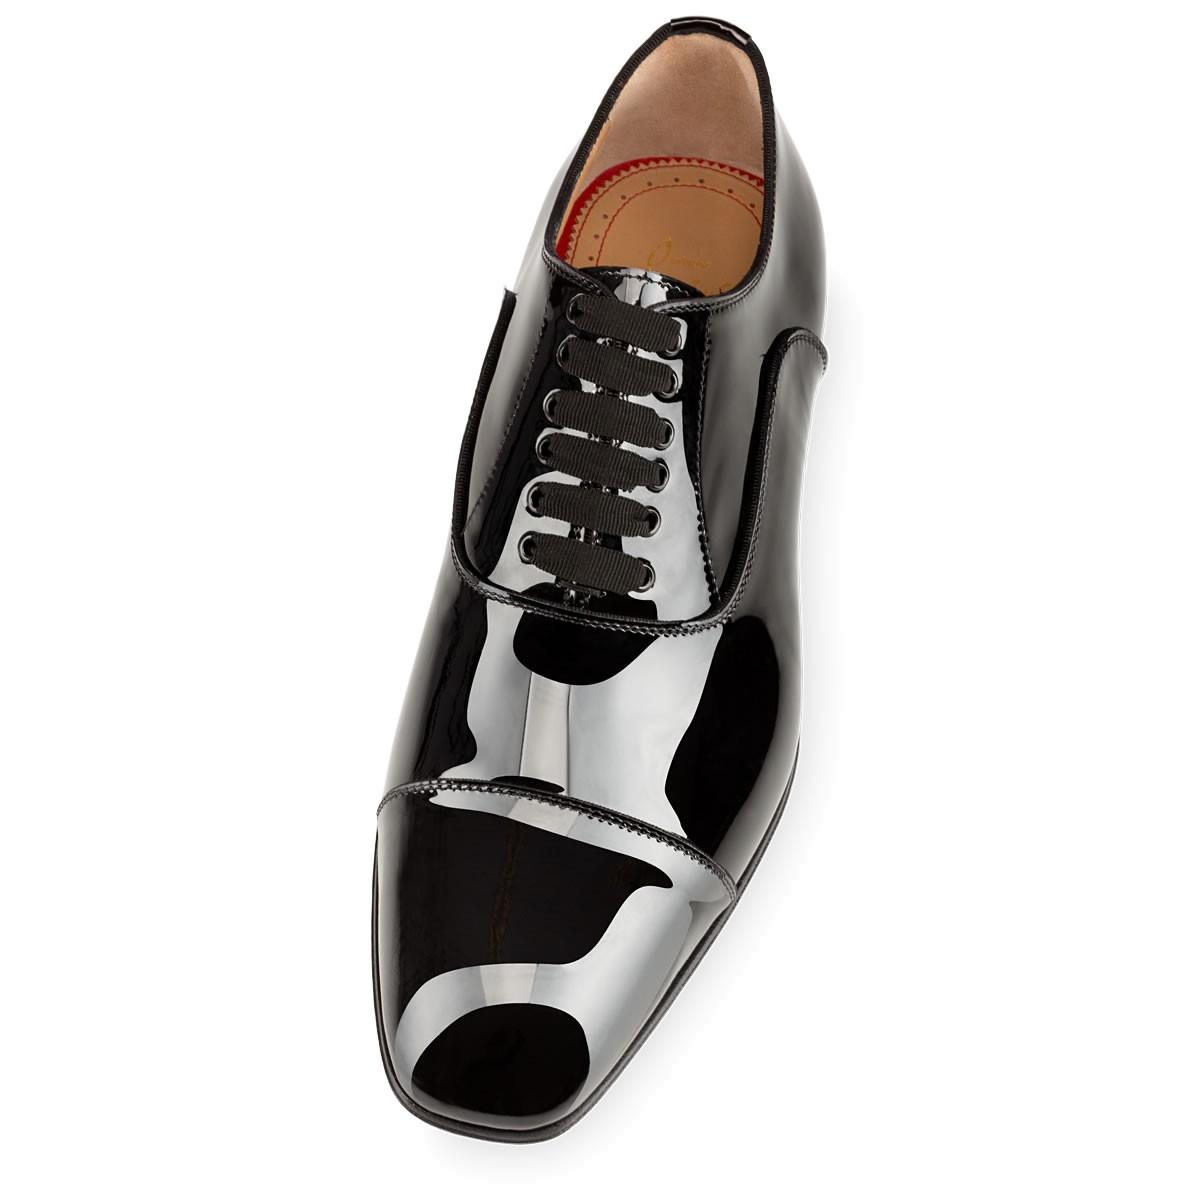 lowest price 8979d d98fa Christian Louboutin Greggo Patent in Black for Men - Lyst